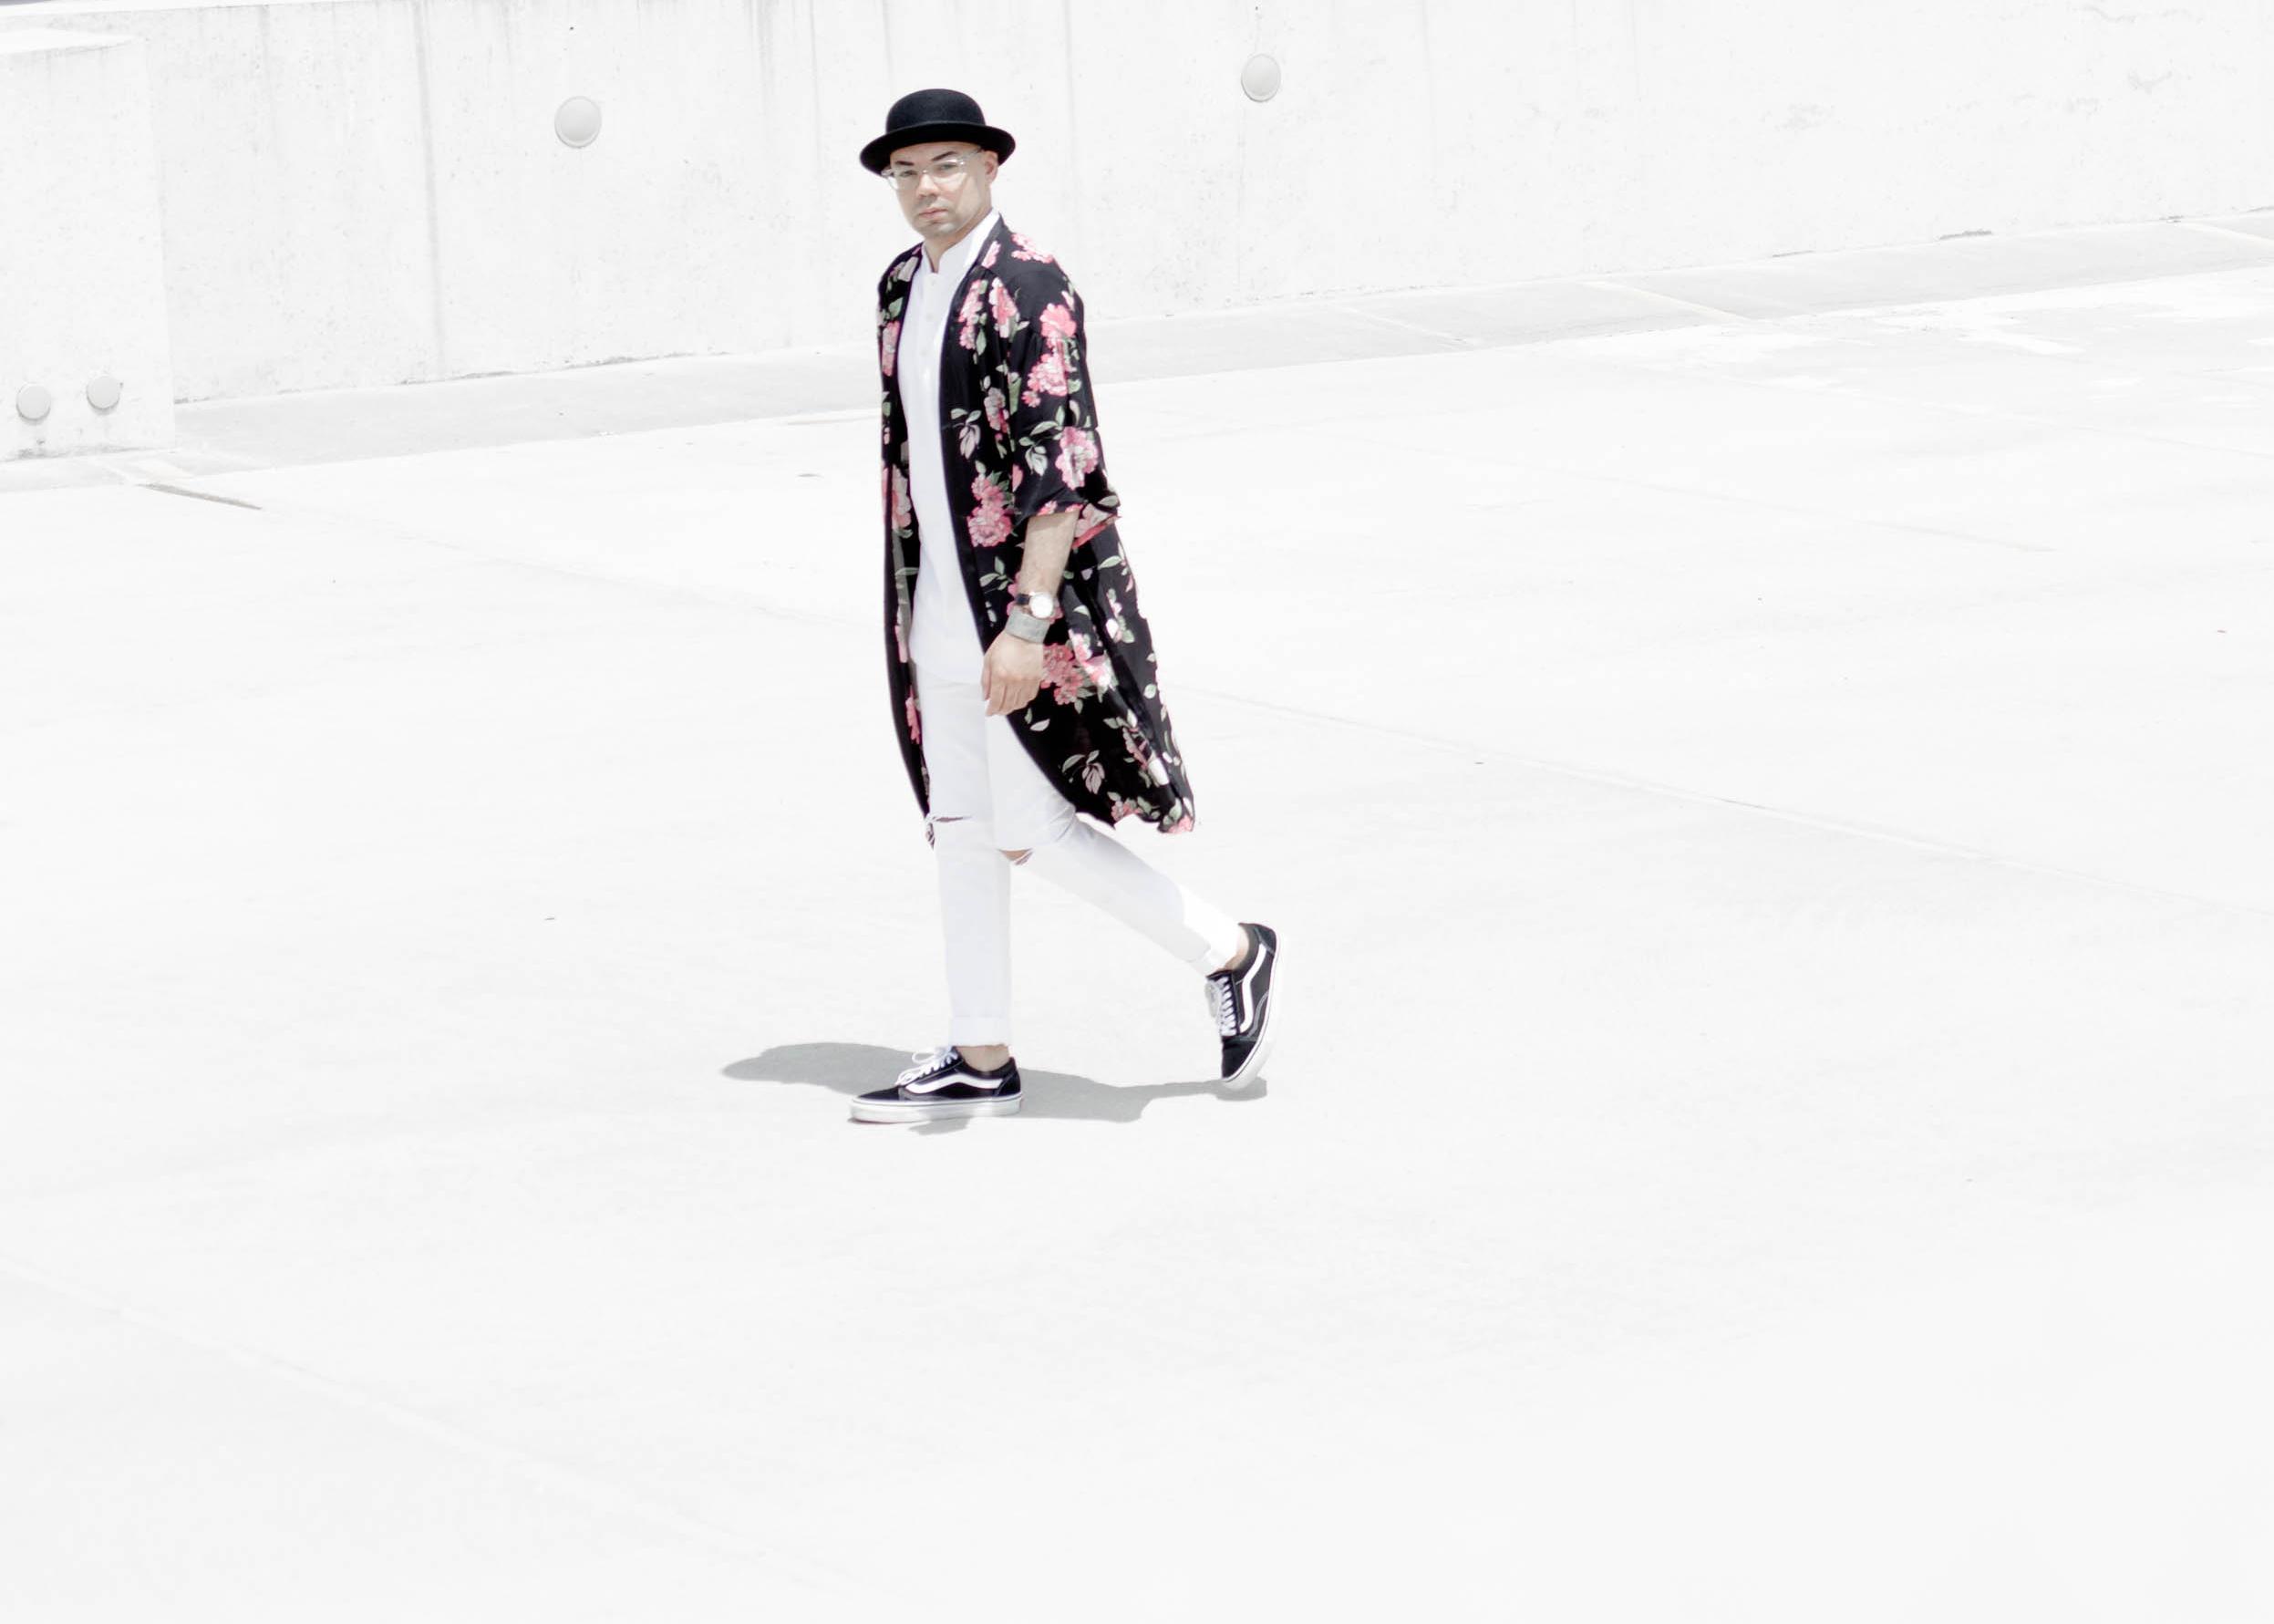 3-ways-to-wear-a-kimono-look-2-walk-far.jpg